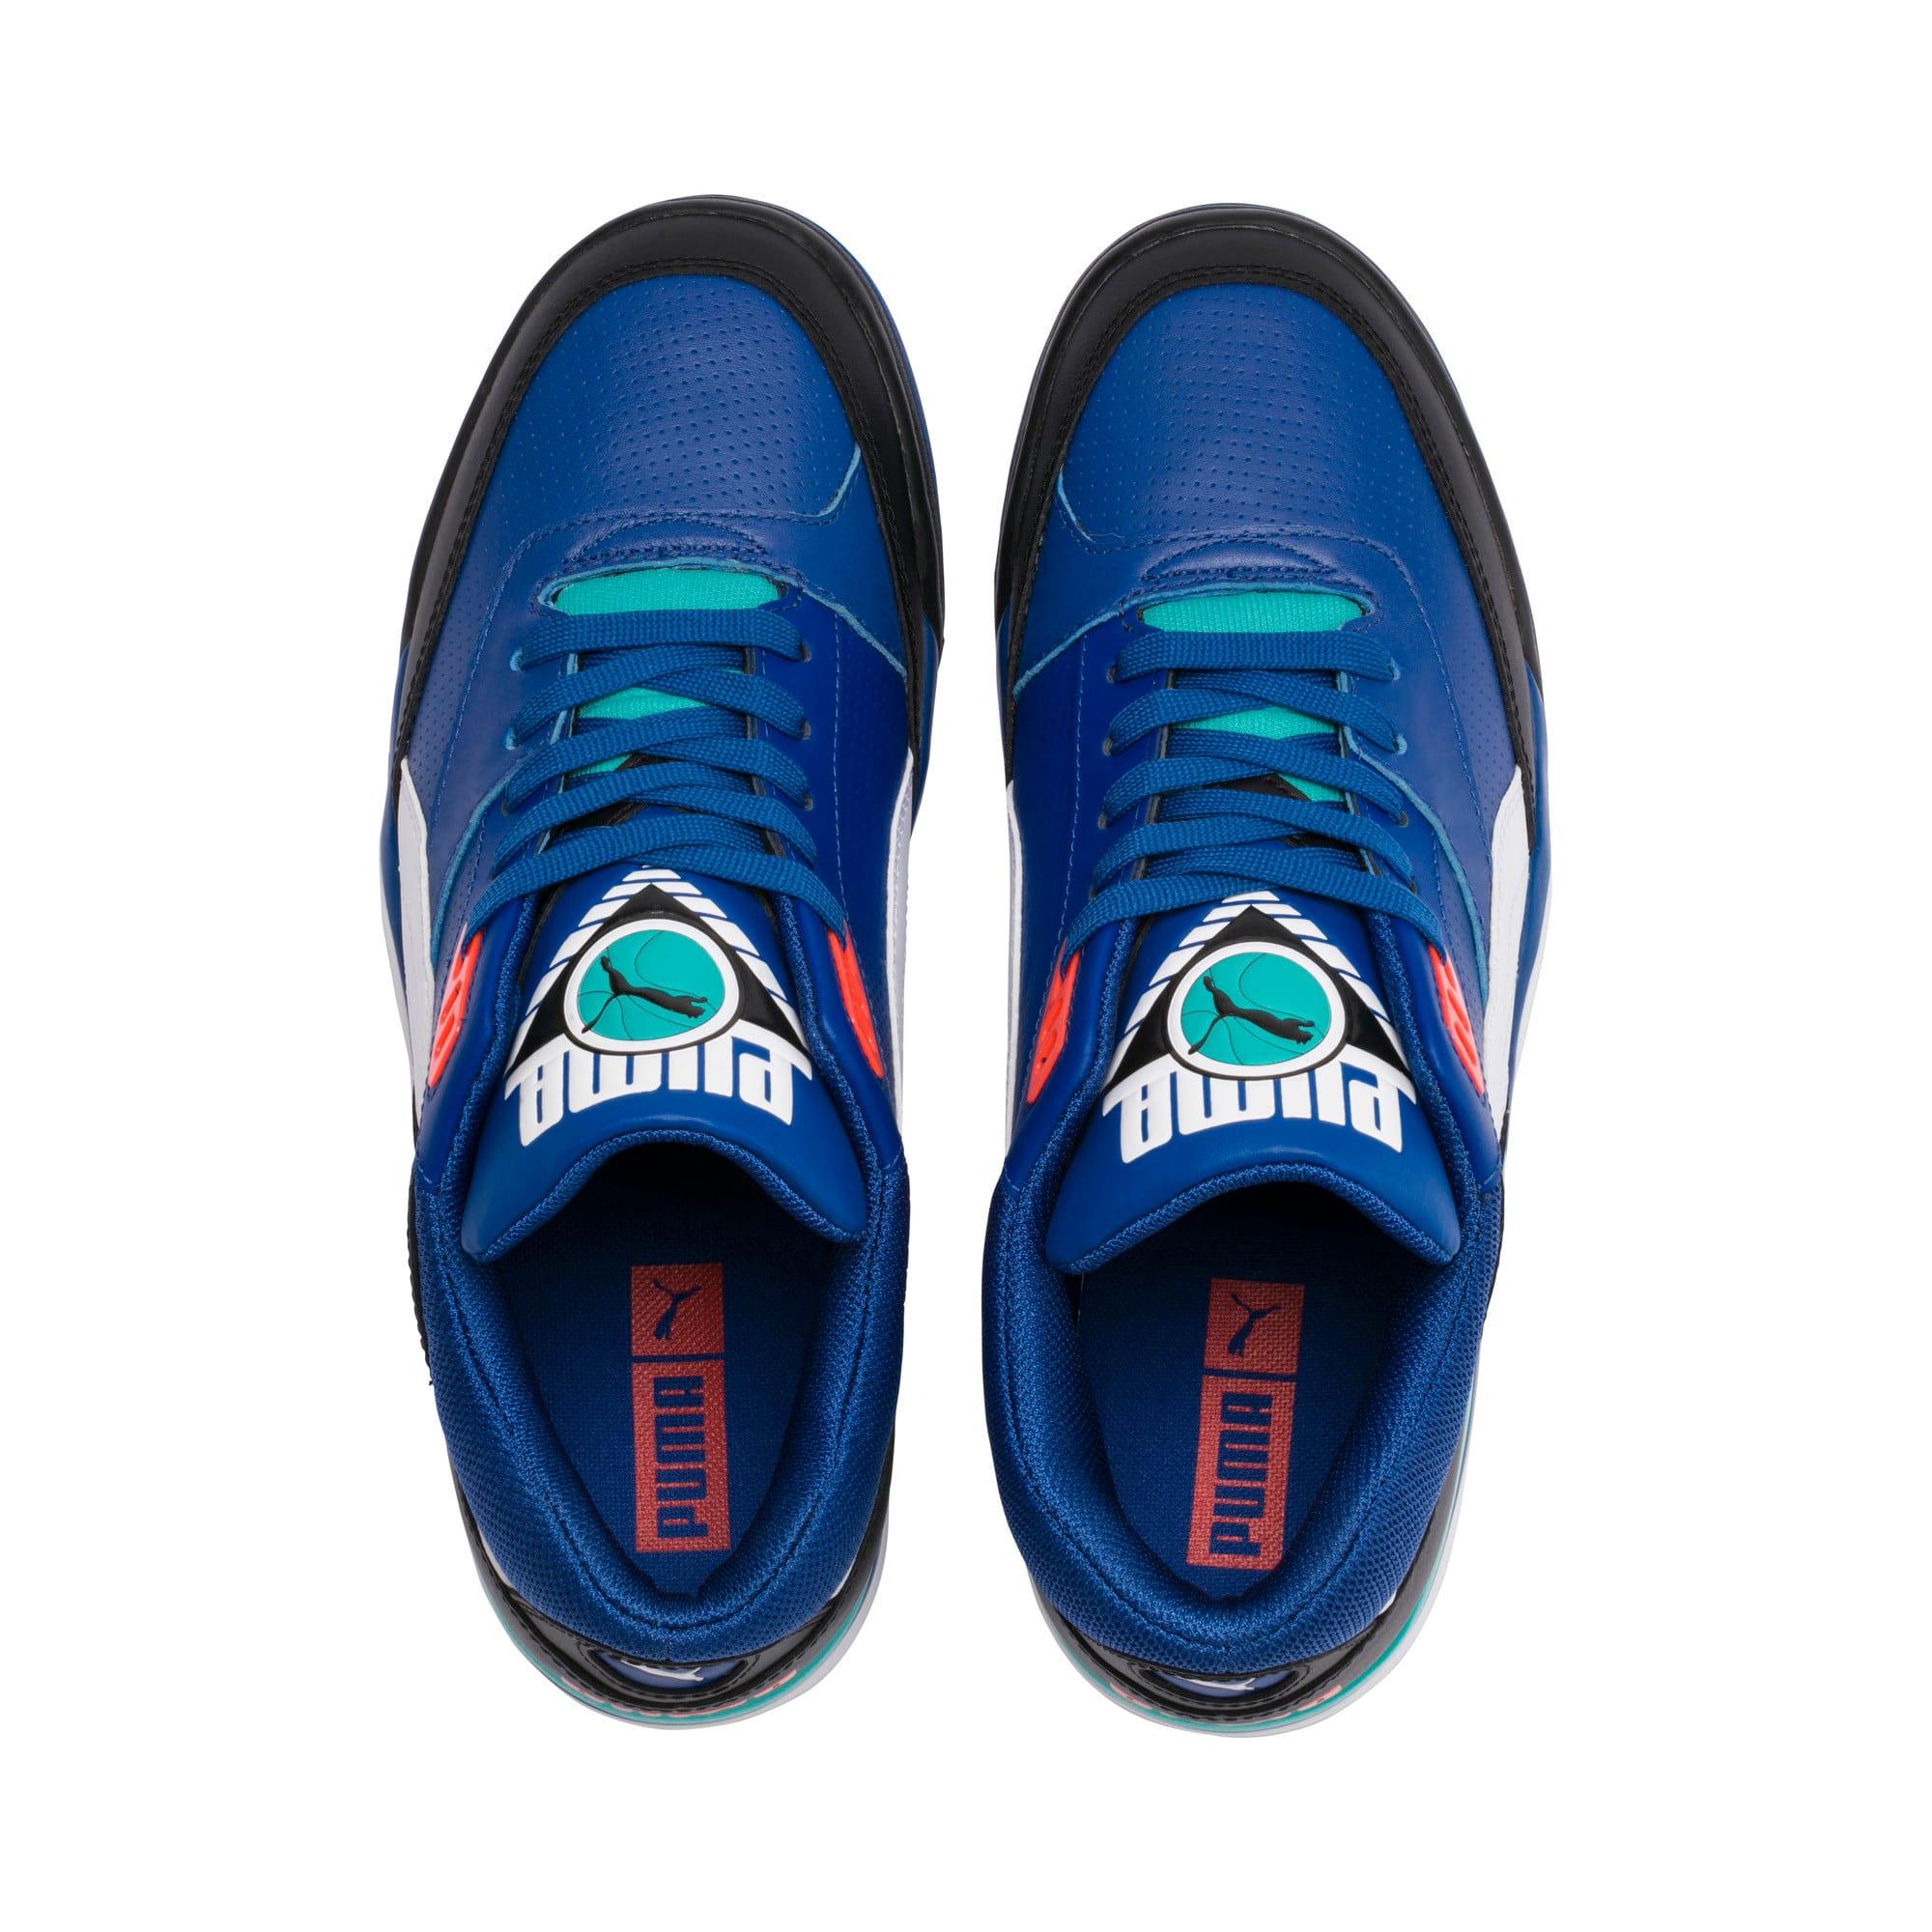 Thumbnail 6 of Palace Guard Sneakers, Puma Black-Puma White-Blue, medium